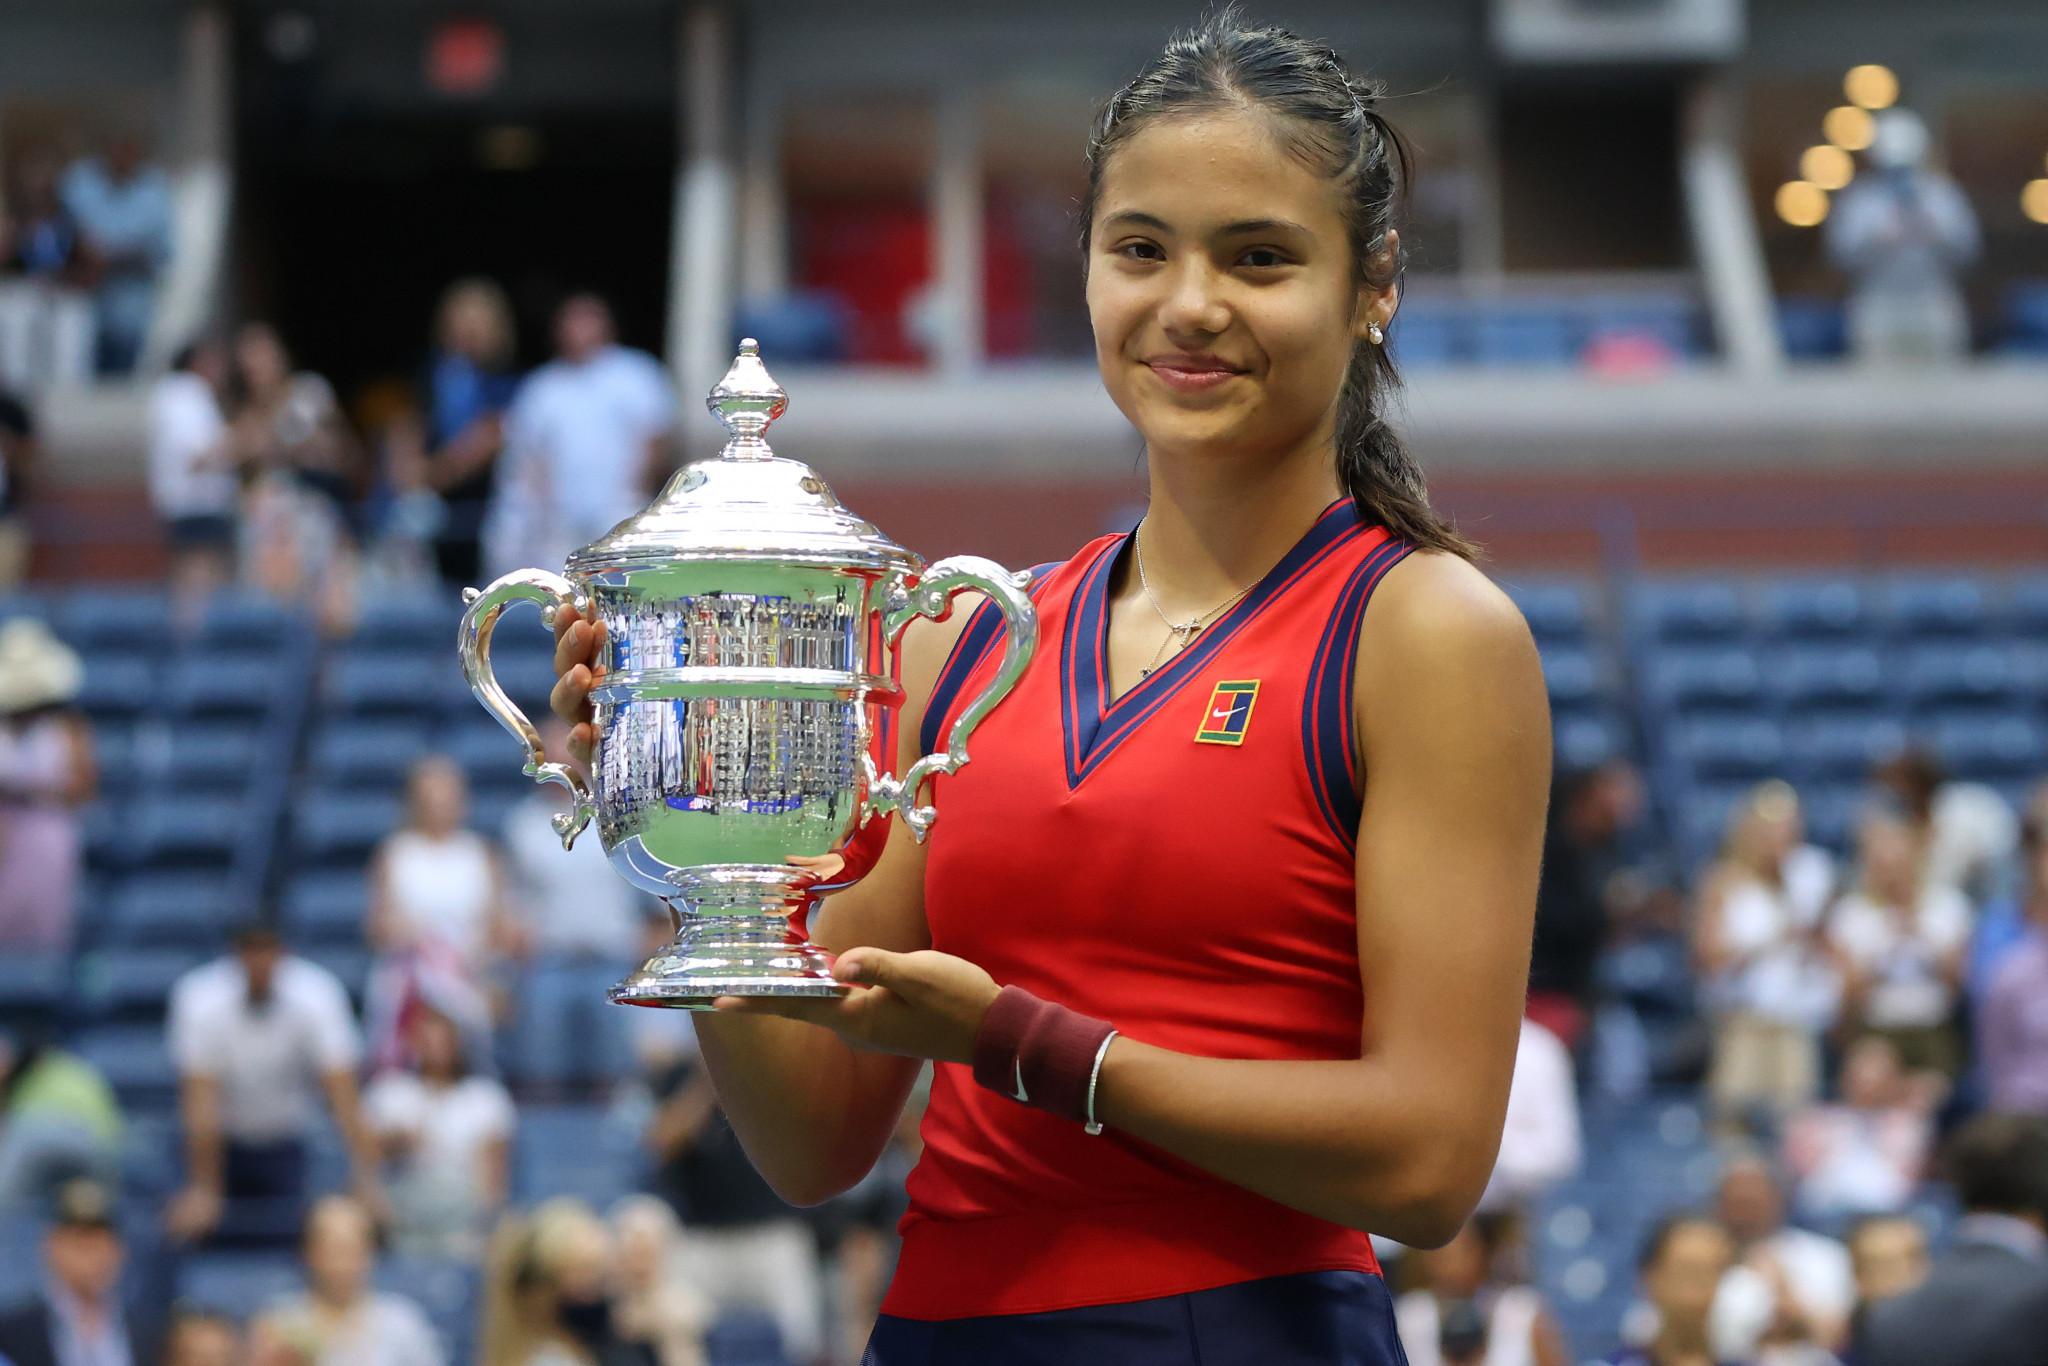 US Open women's singles final draws more ESPN viewers than men's singles final